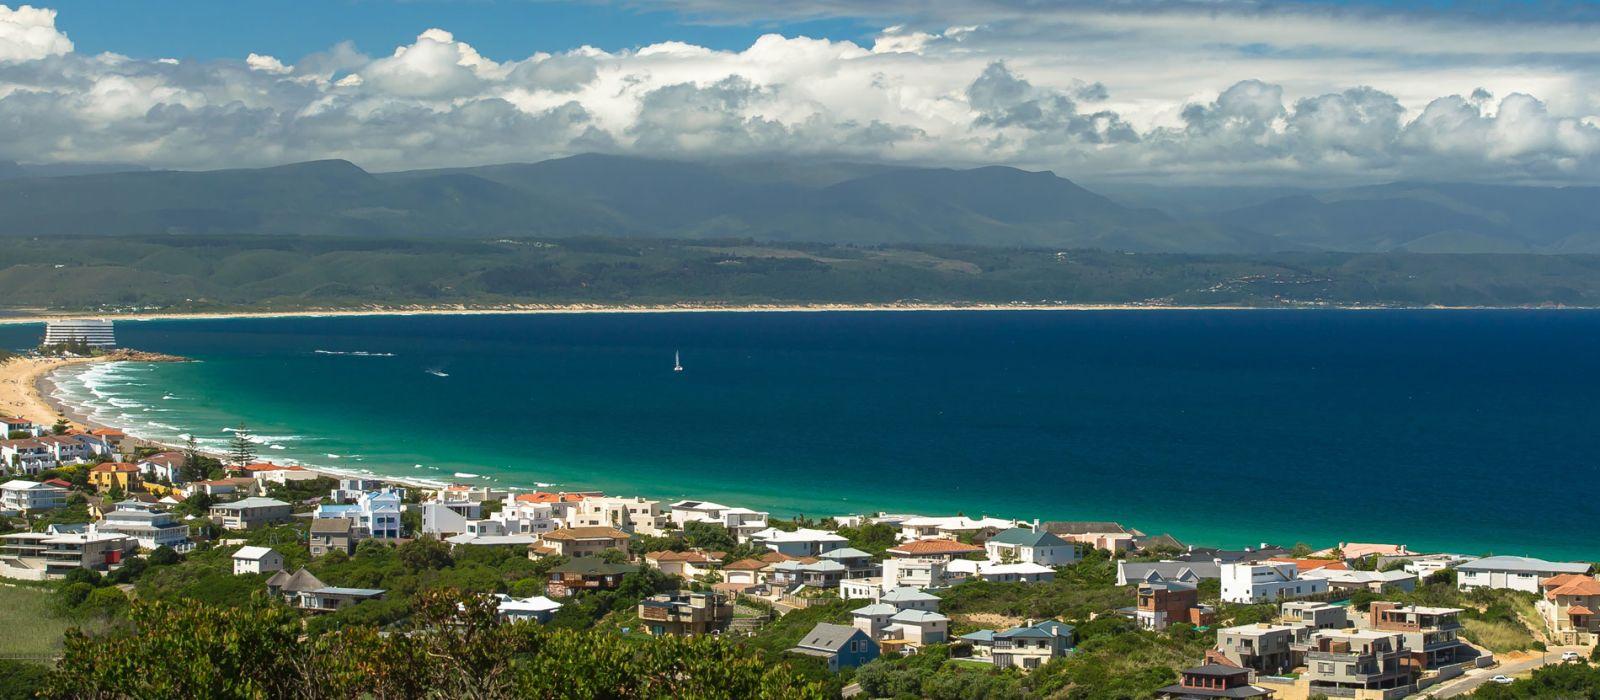 Destination Plettenberg Bay South Africa